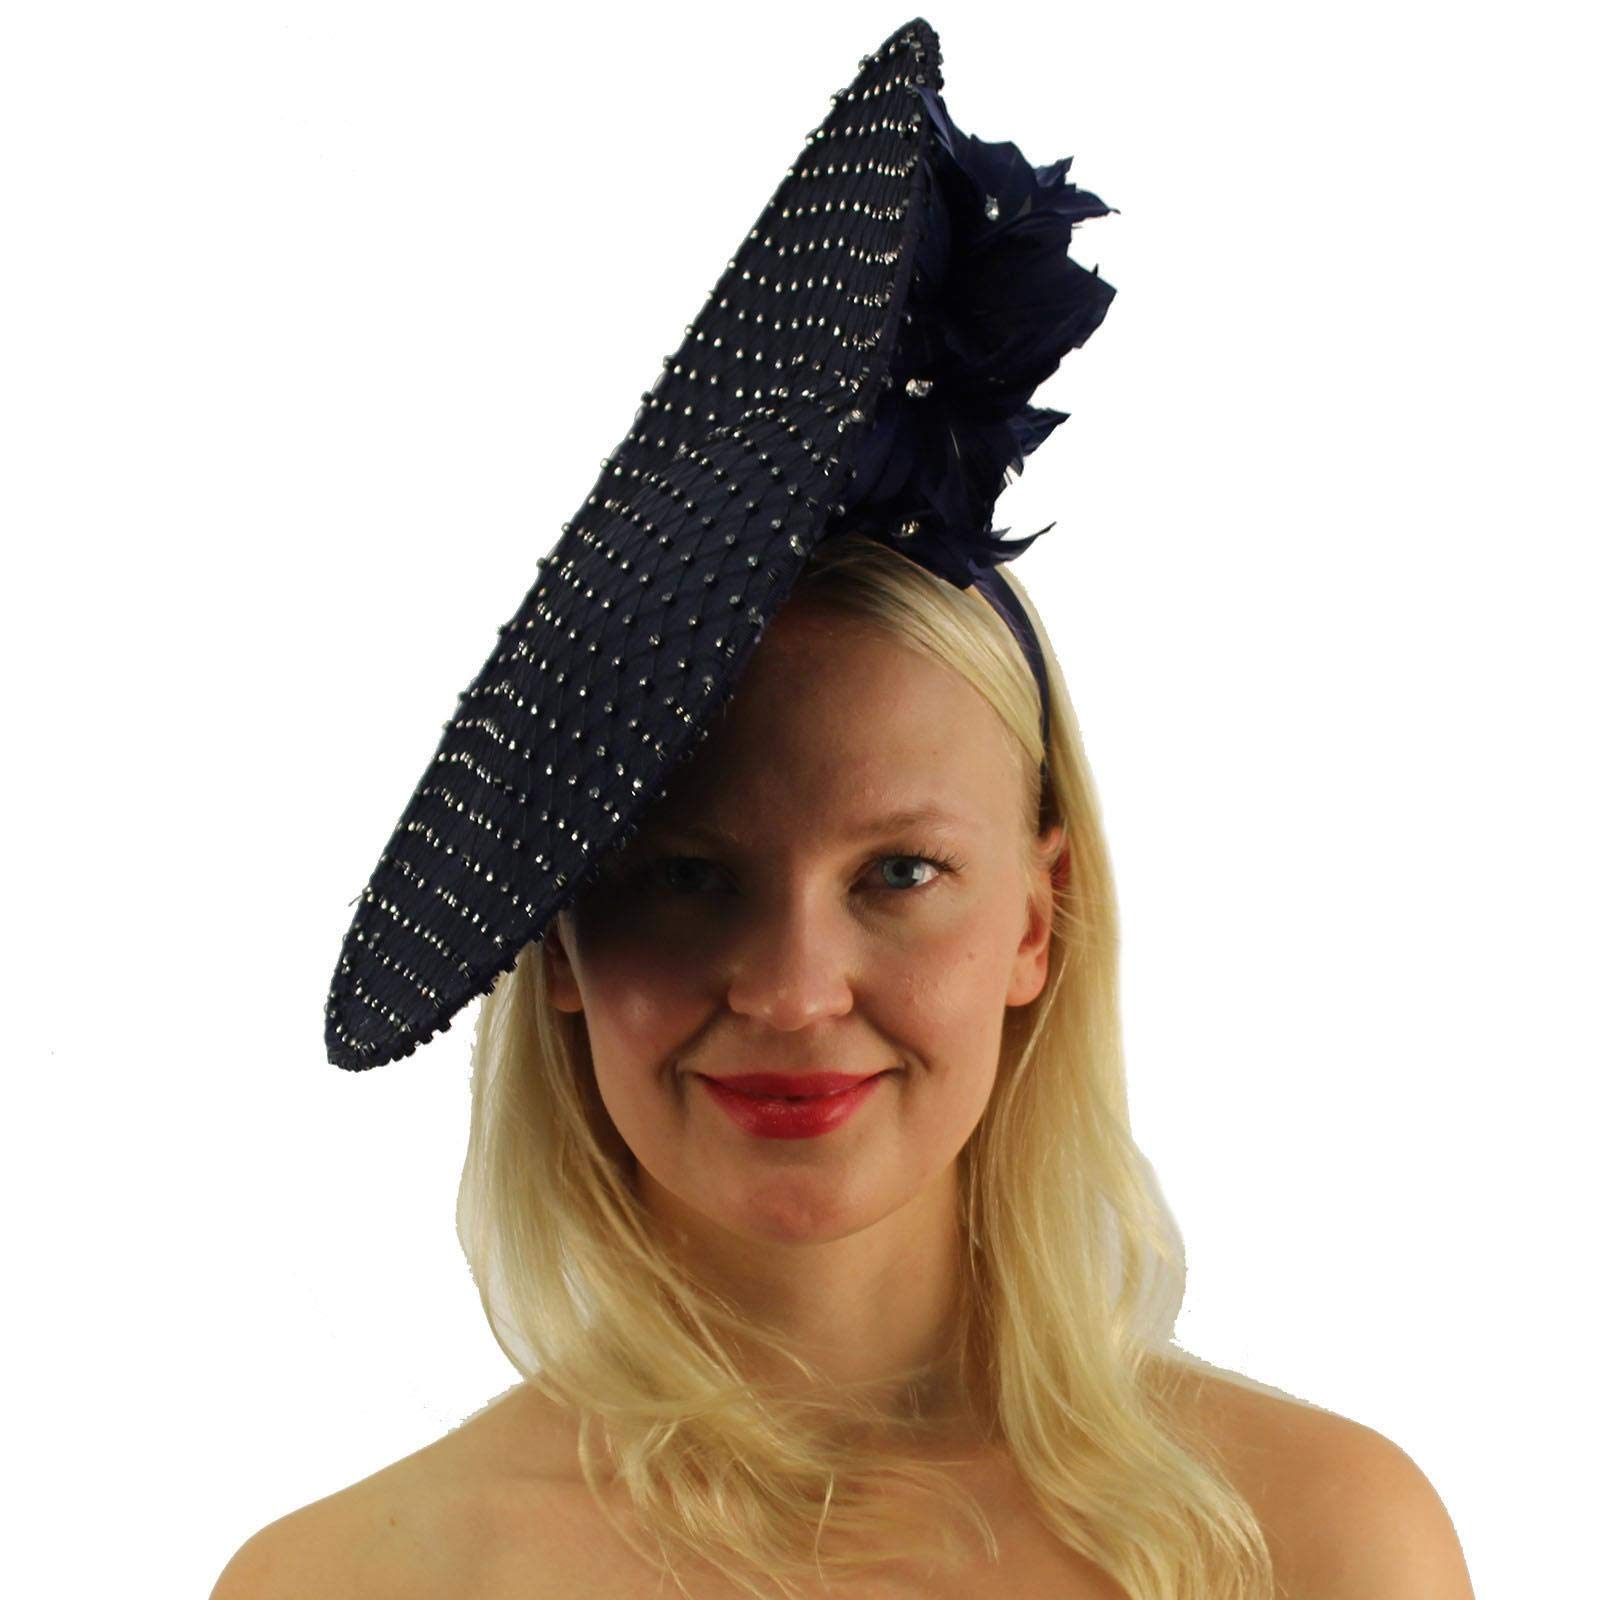 Royal Rhinestones Netting Feathers Fascinators Headband Cocktail Derby Hat Navy